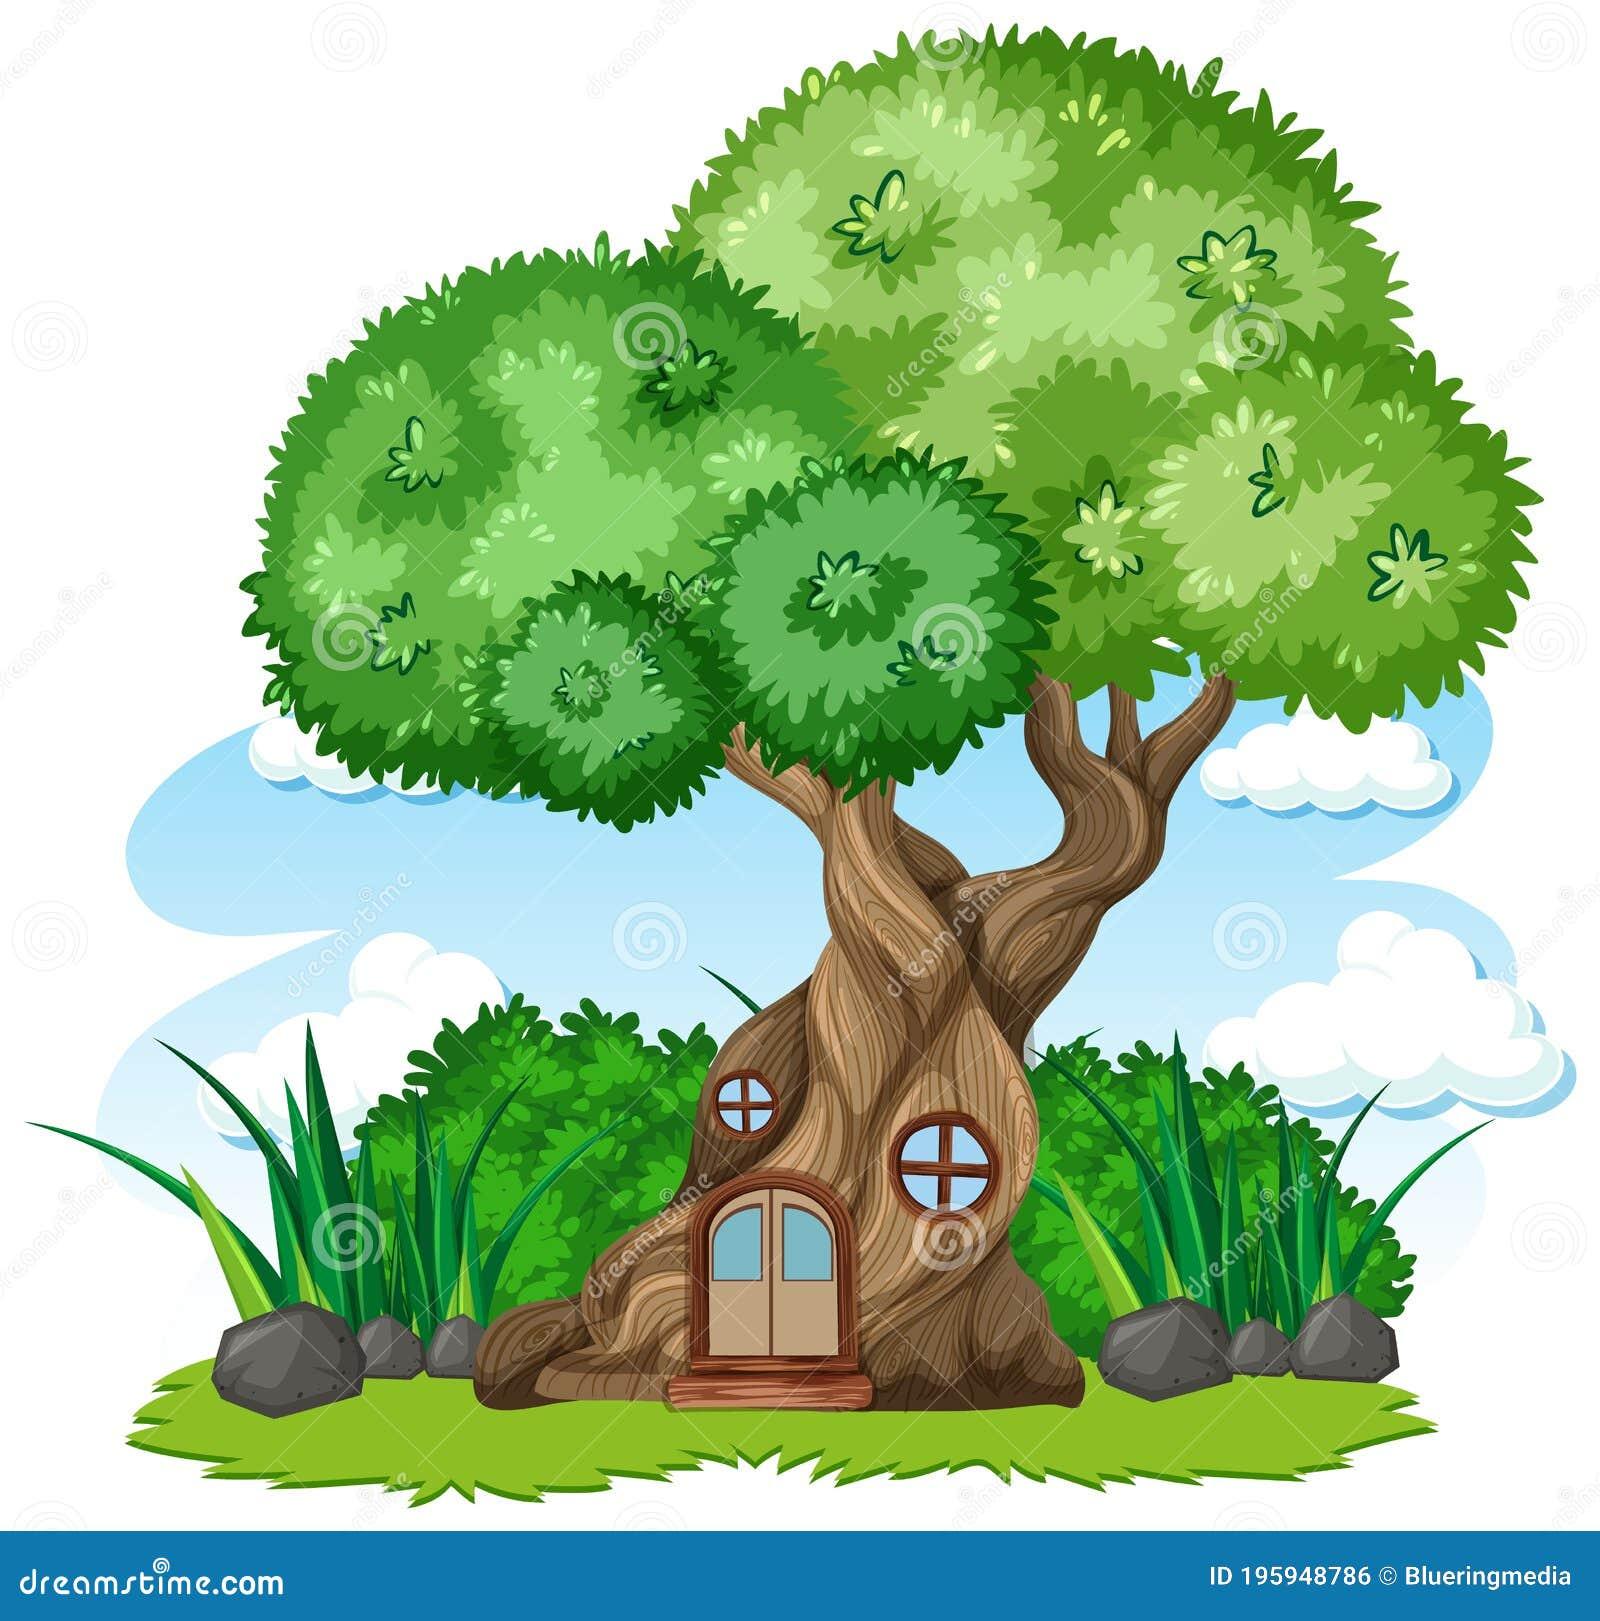 Cartoon Grass Tree Stock Illustrations 44 928 Cartoon Grass Tree Stock Illustrations Vectors Clipart Dreamstime Cartoon tree transparent images (6,688). dreamstime com